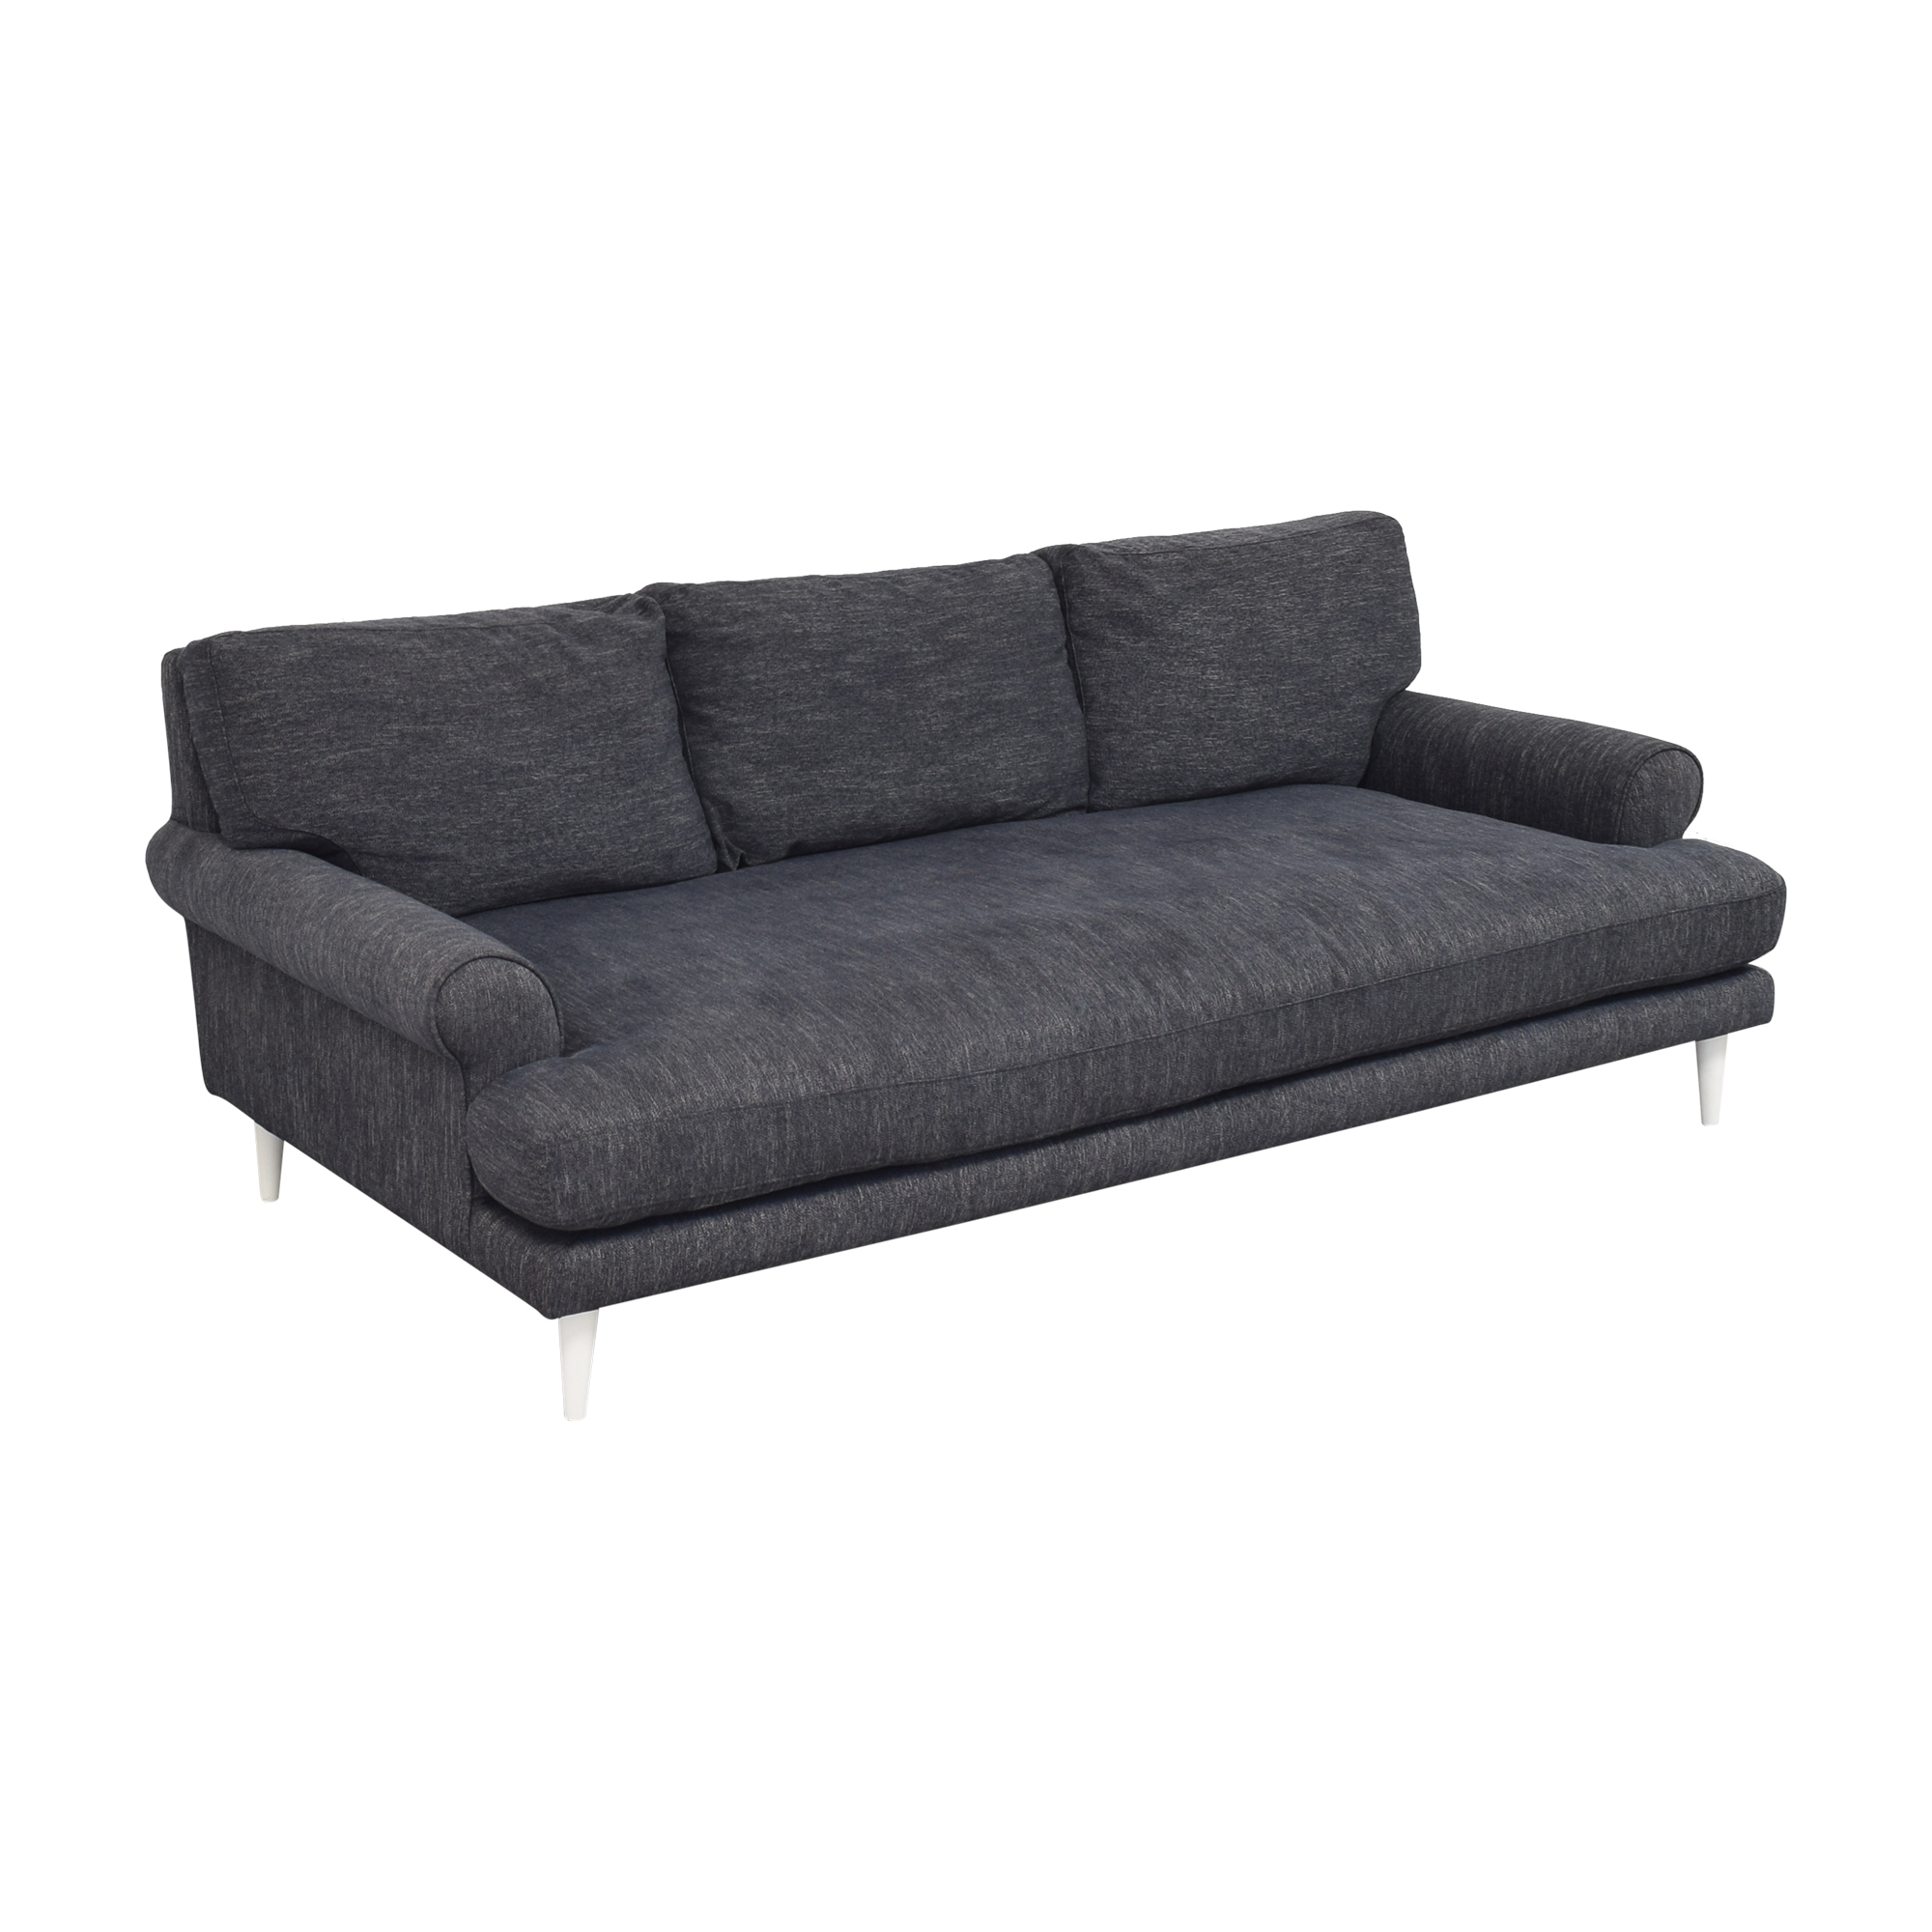 shop Interior Define Maxwell Bench Cushion Sofa Interior Define Sofas